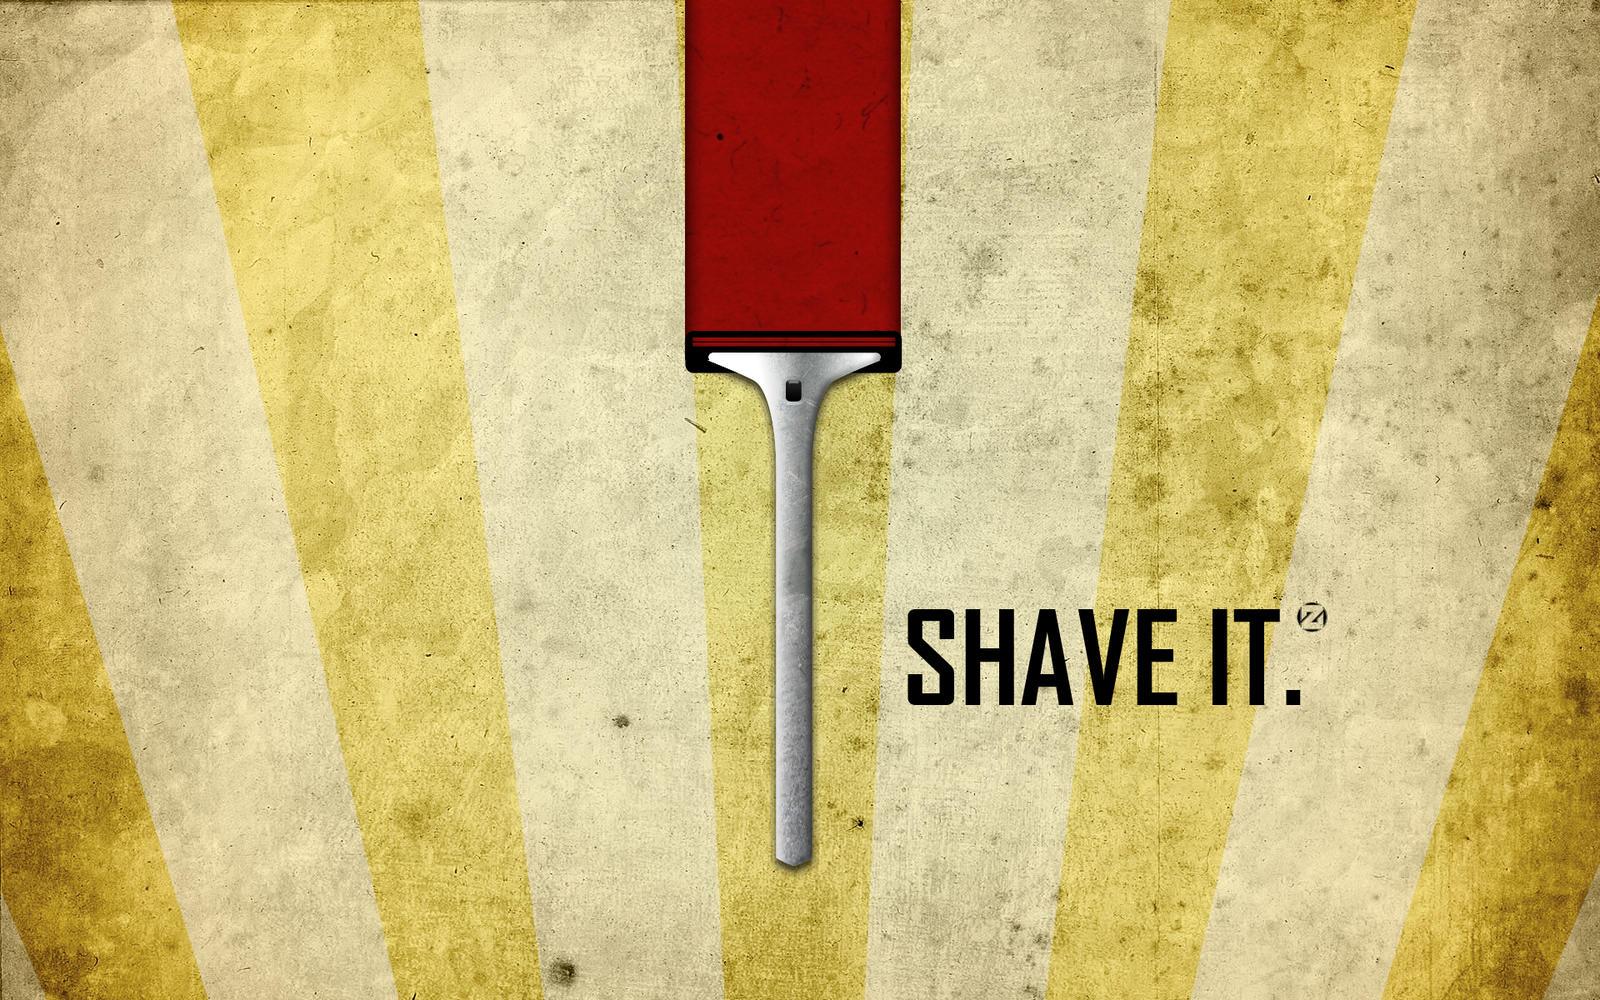 Zedd Shave It Wallpaper by ValencyGraphics